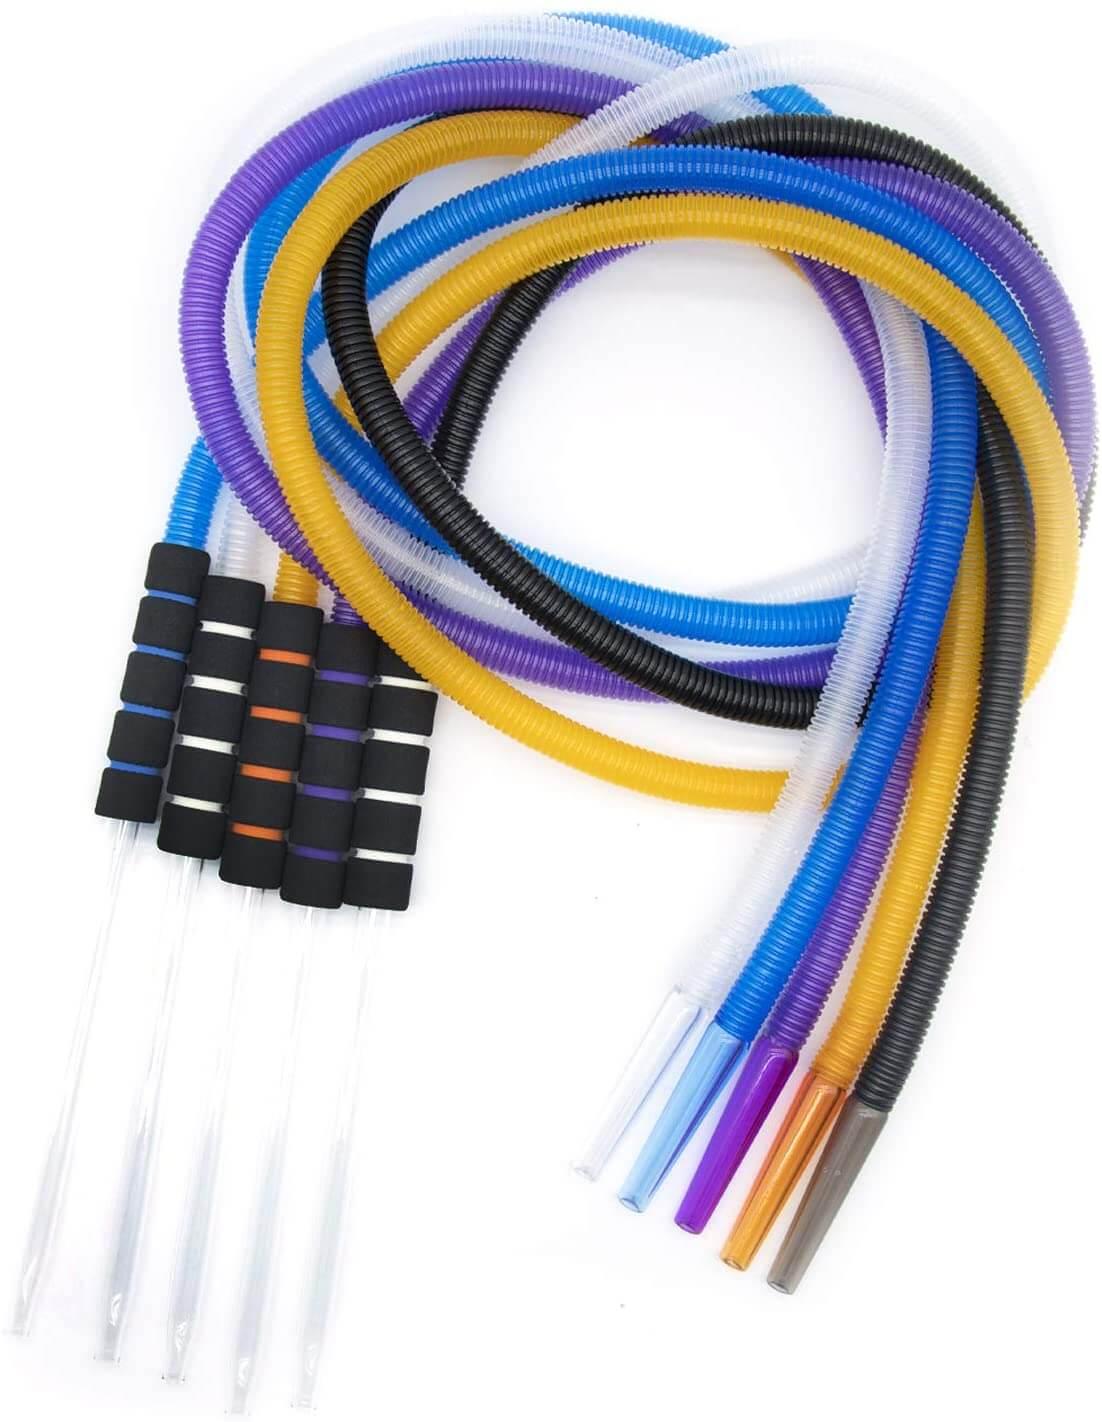 Disposable hookah hoses